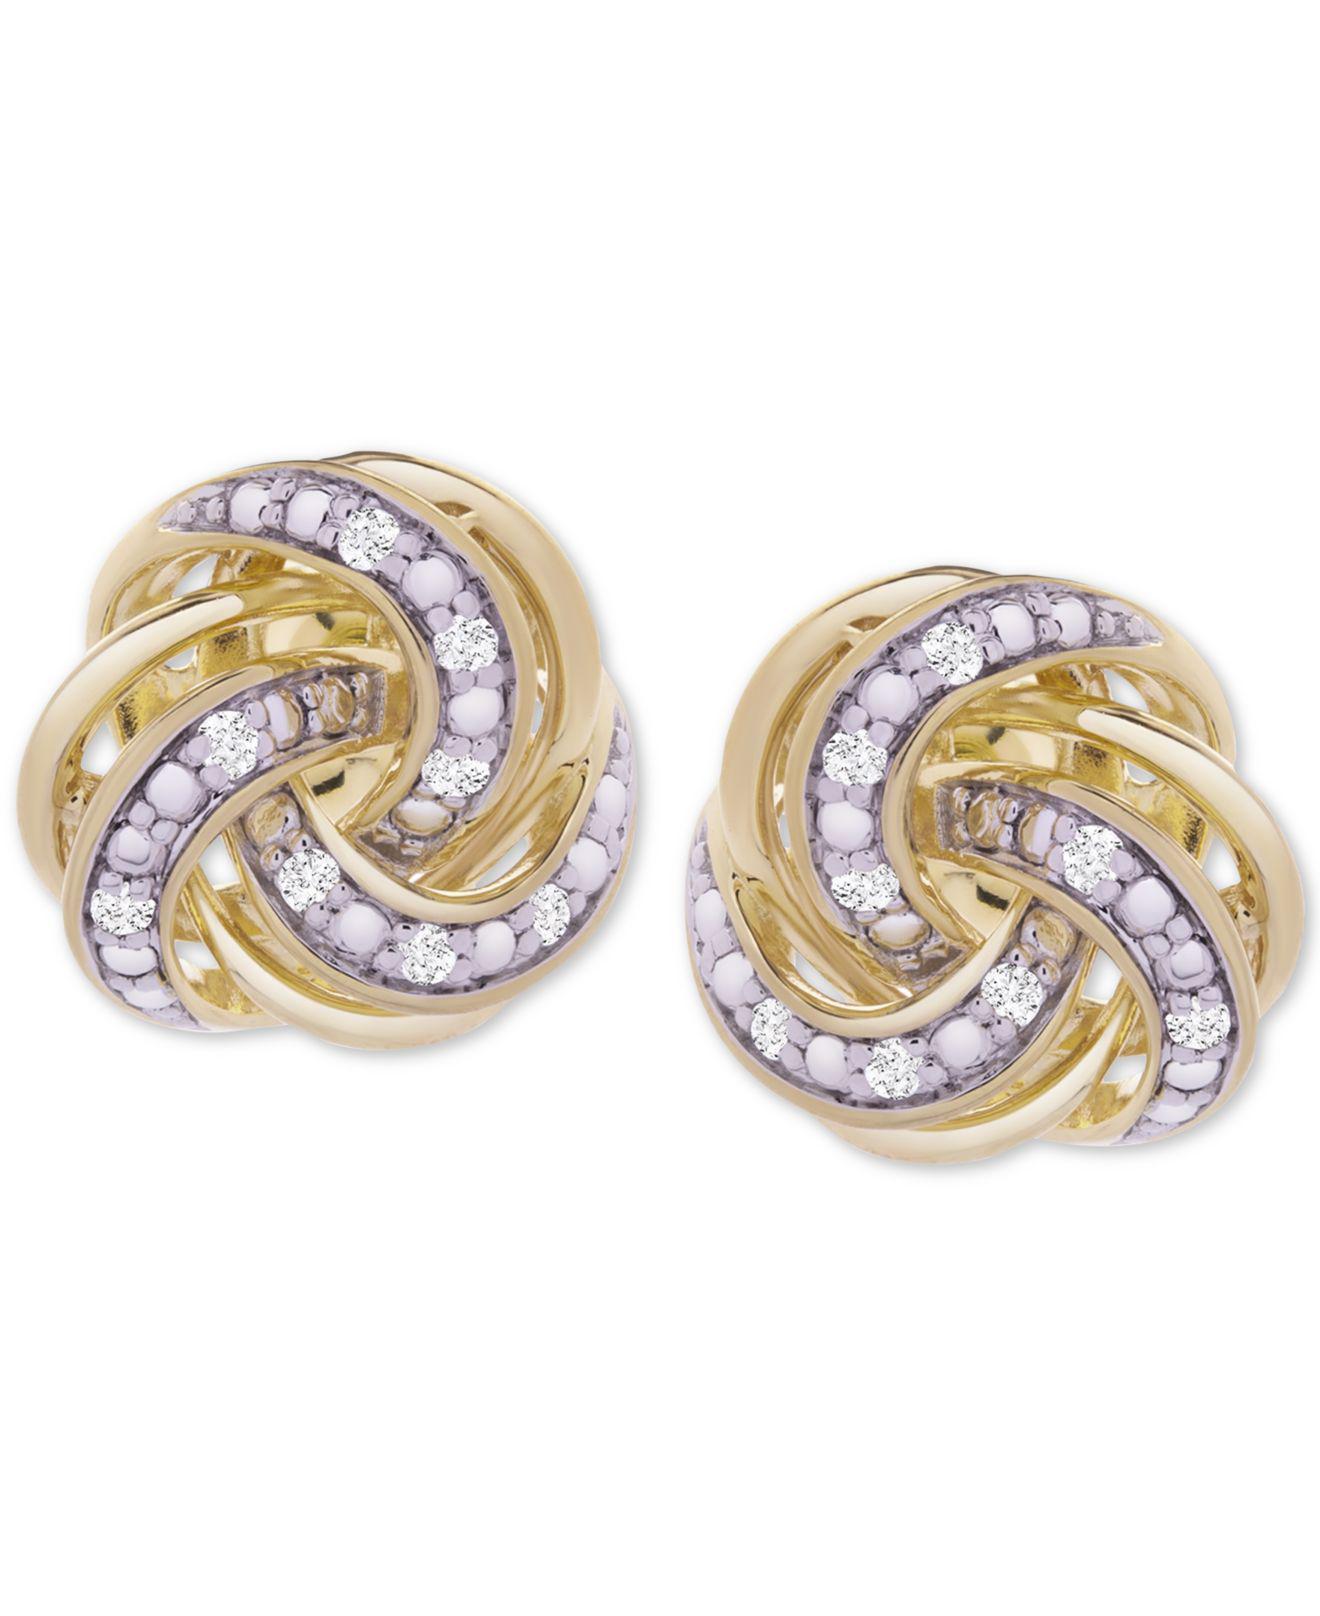 76a1d62daac8e9 Macy's Diamond Knot Stud Earrings (1/10 Ct. T.w.) In 14k Gold-plated ...